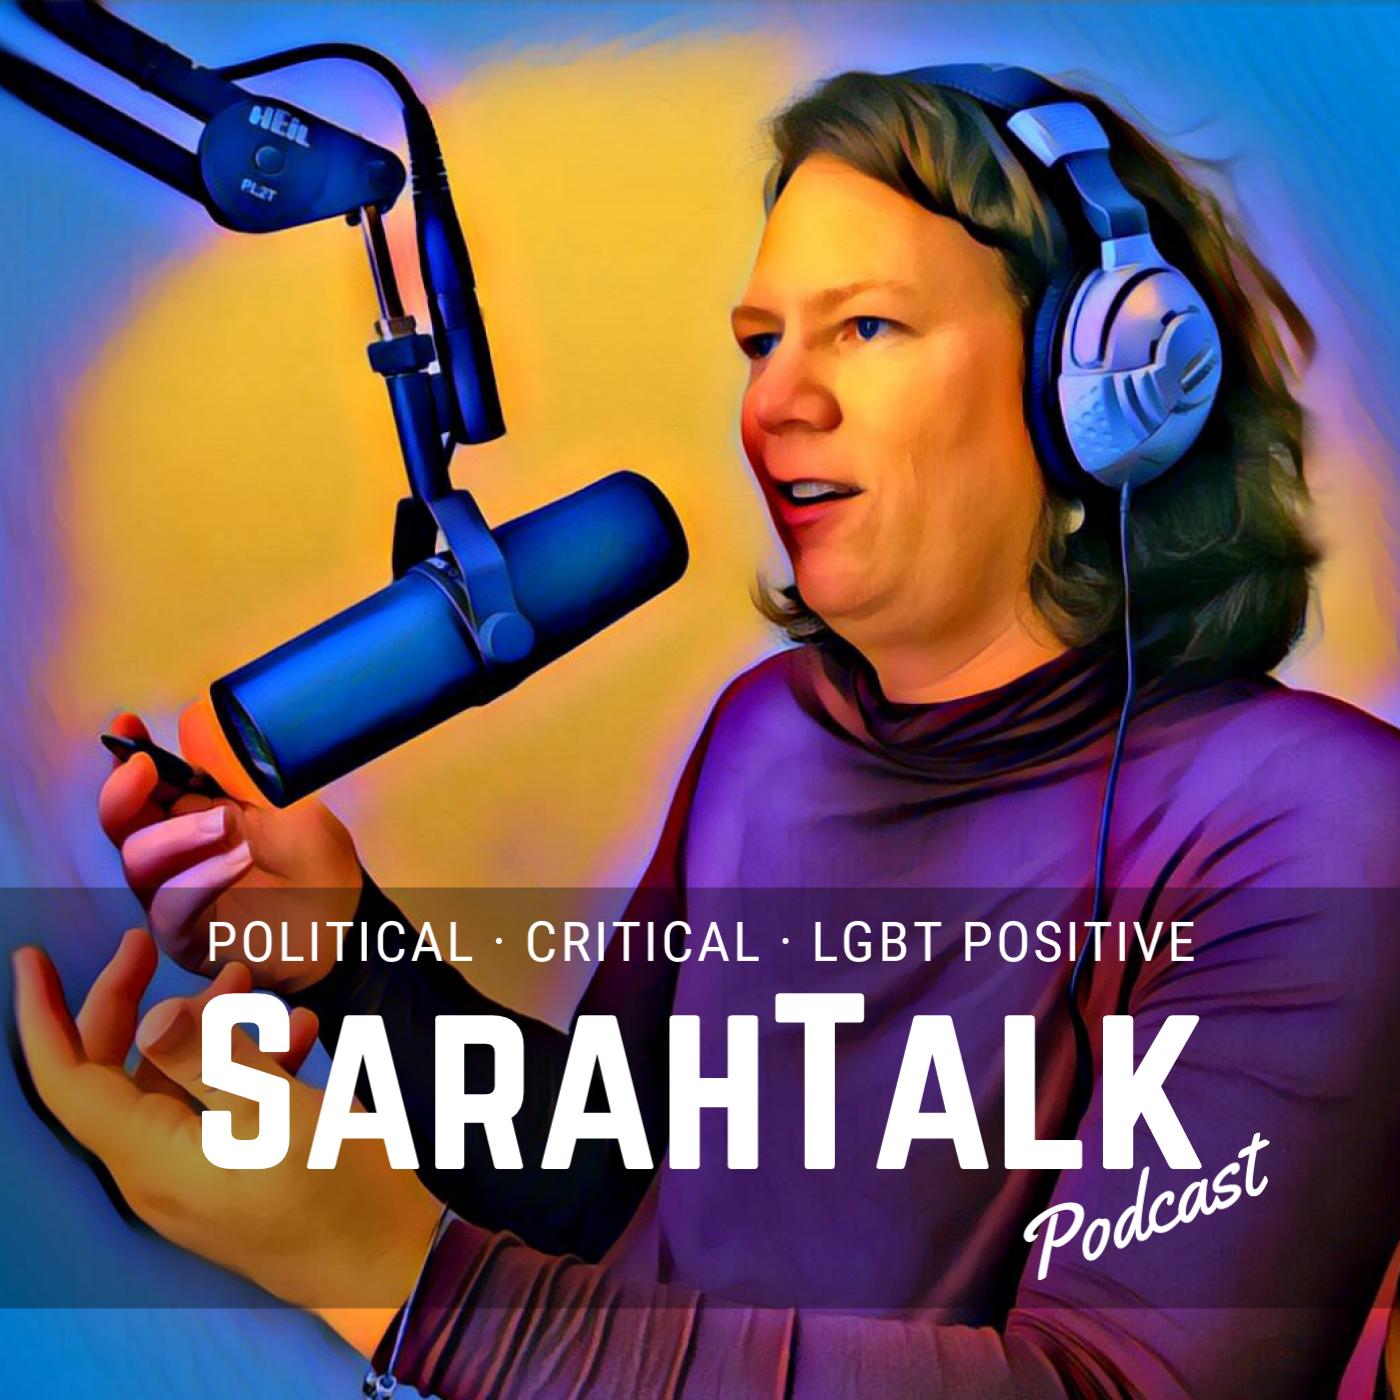 SarahTalk Podcast show art